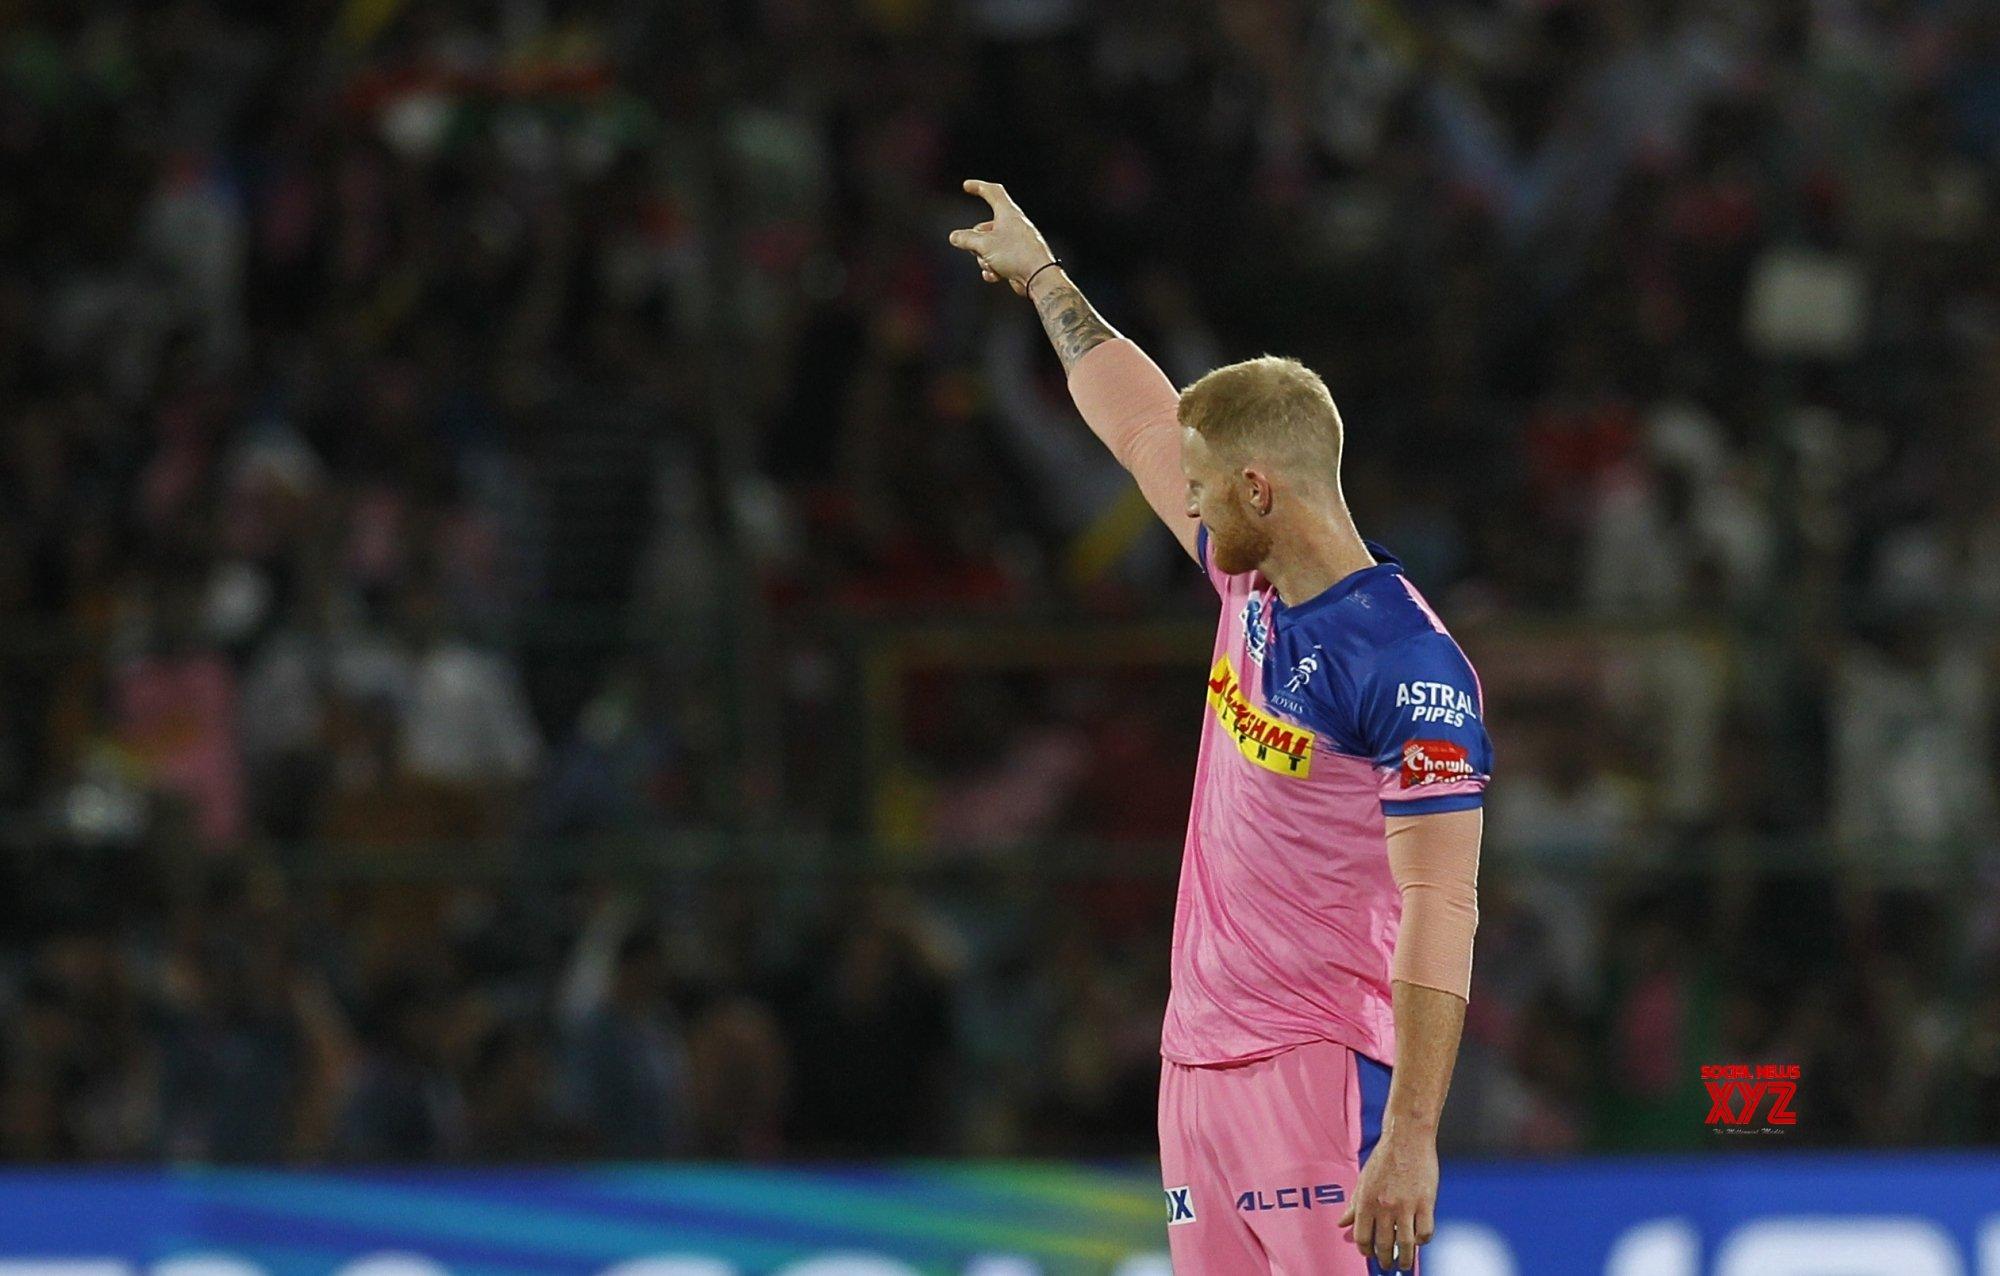 Stokes still preparing for IPL despite India lockdown